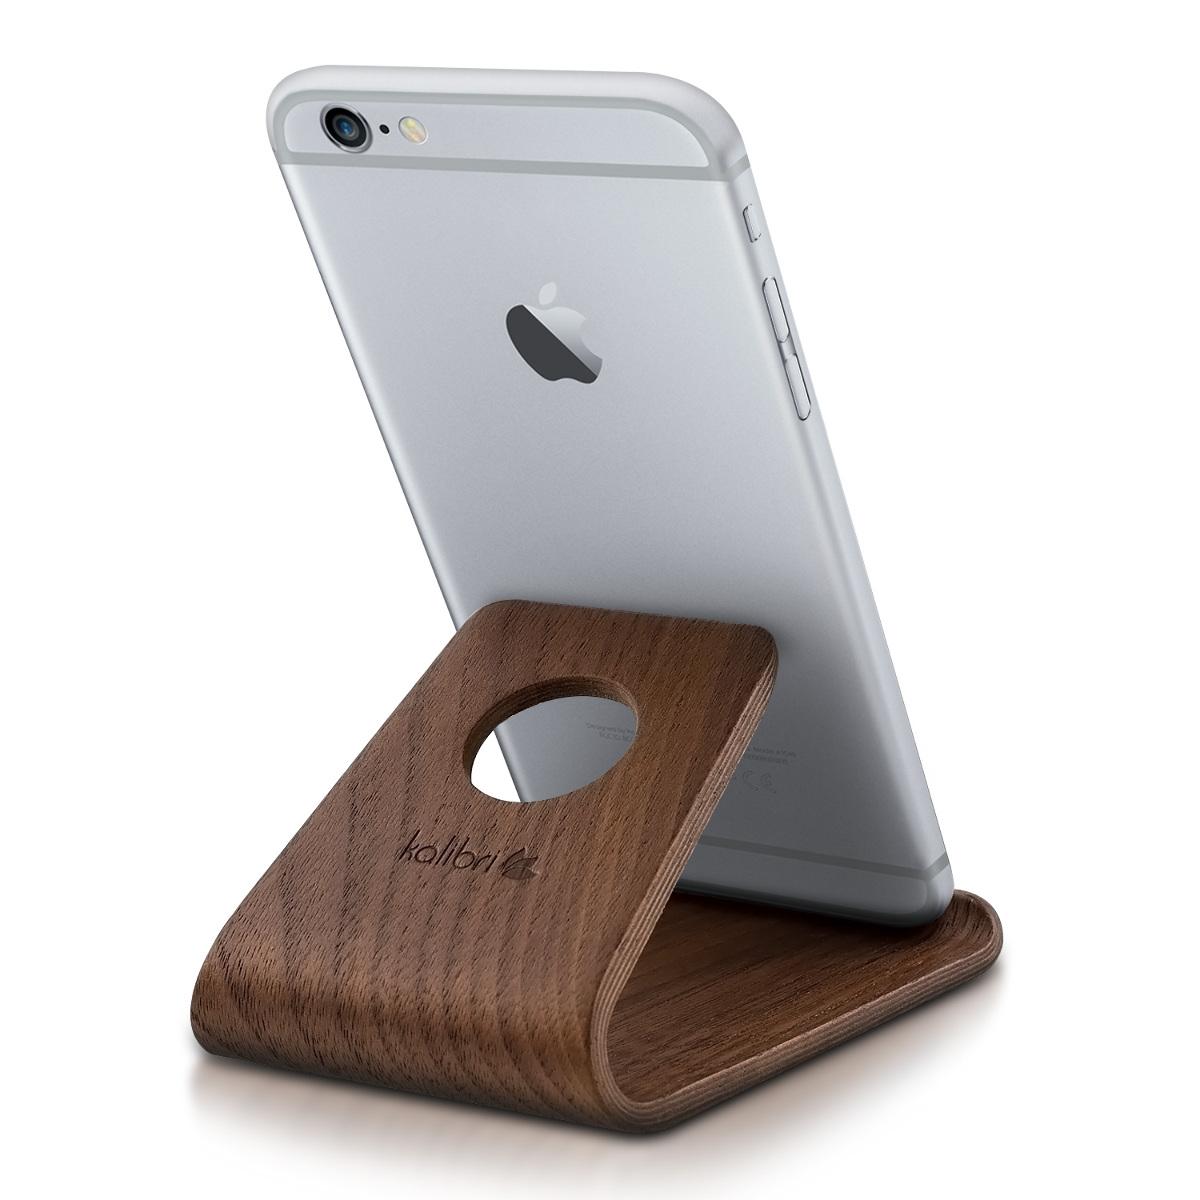 Kalibri Universal Wooden Stand - Ξύλινη Βάση για iPhone / Android / Tablet / e-Reader - Dark Brown (34561.18)